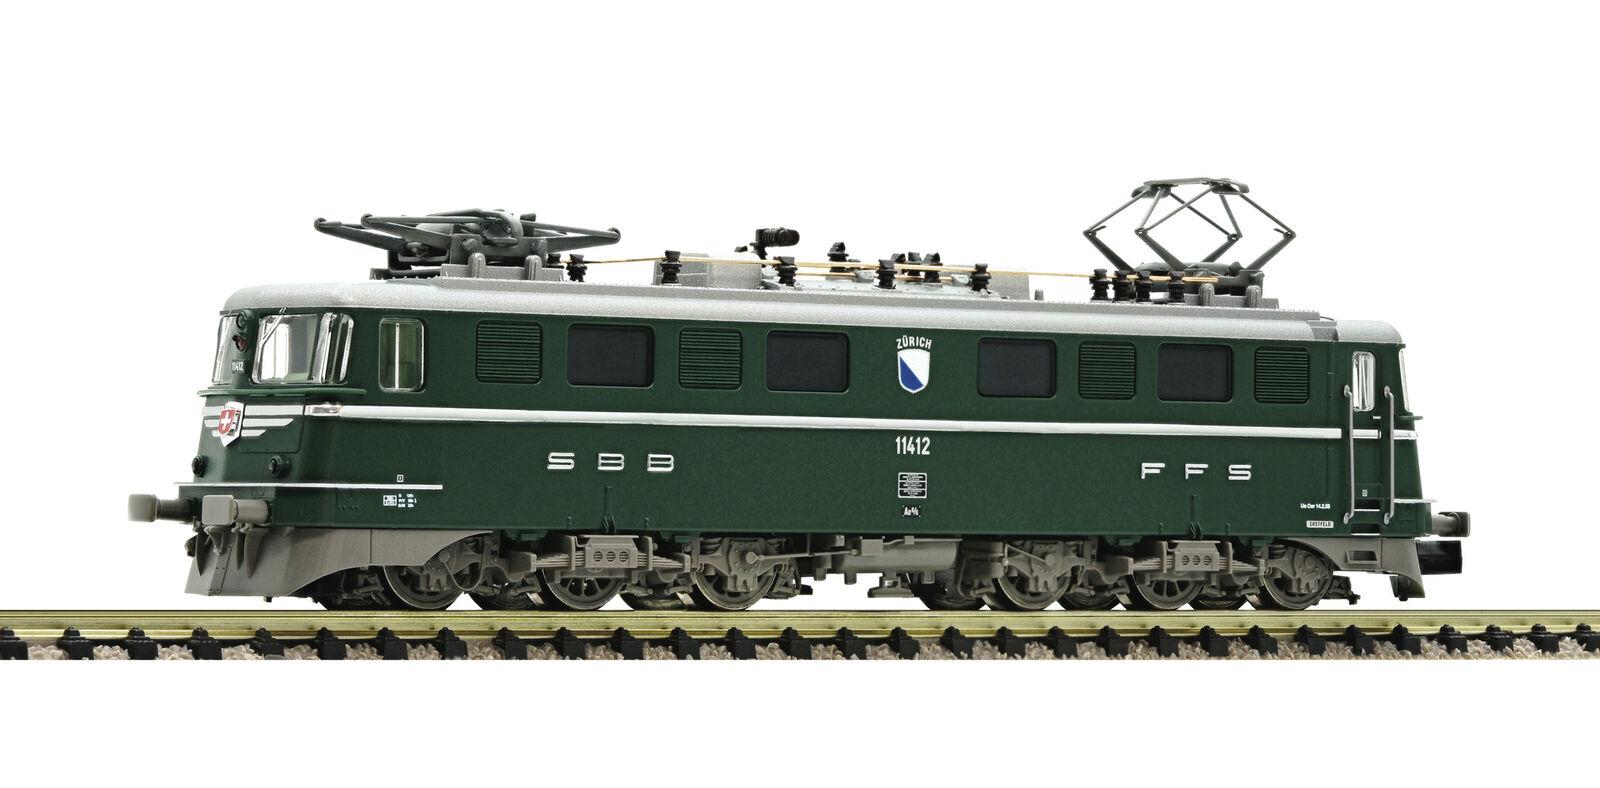 Fleischmann 737291 N elektrolokomotive AE 6/6  kantonslok   Verde , SBB DCC SOUND